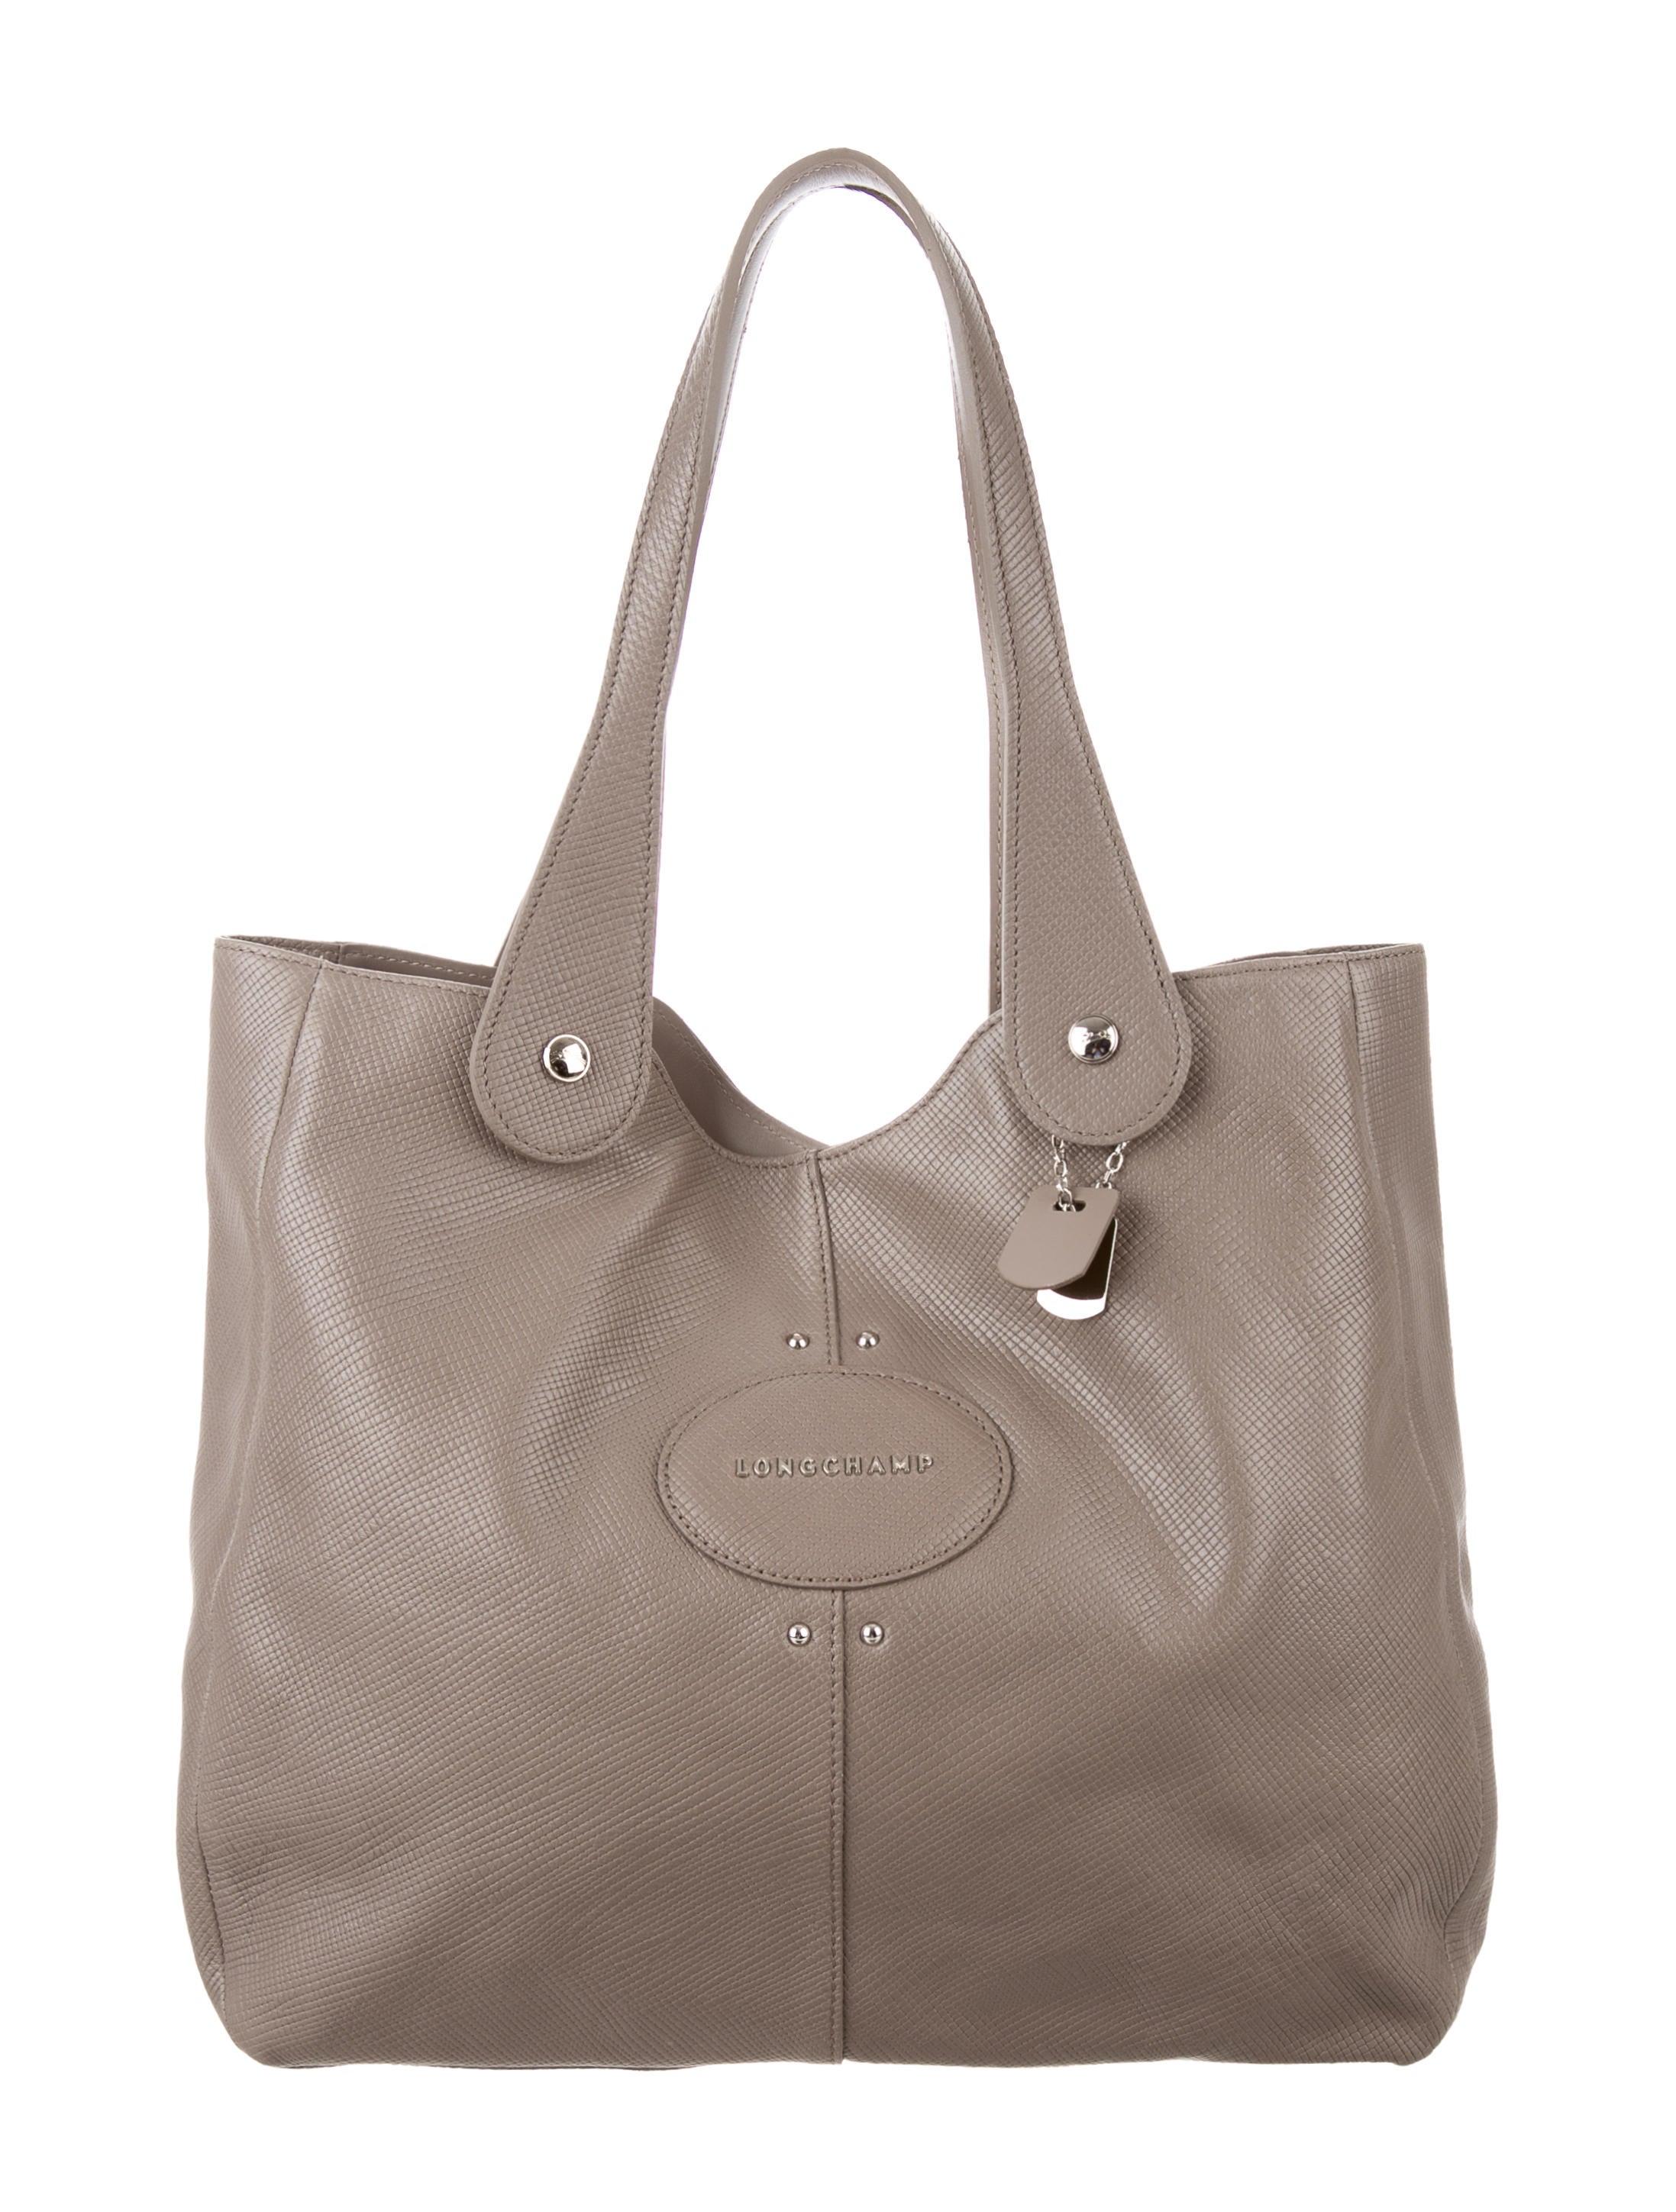 Longchamp Quadri Shopper Tote Handbags Wl820512 The Realreal Quadry Bag